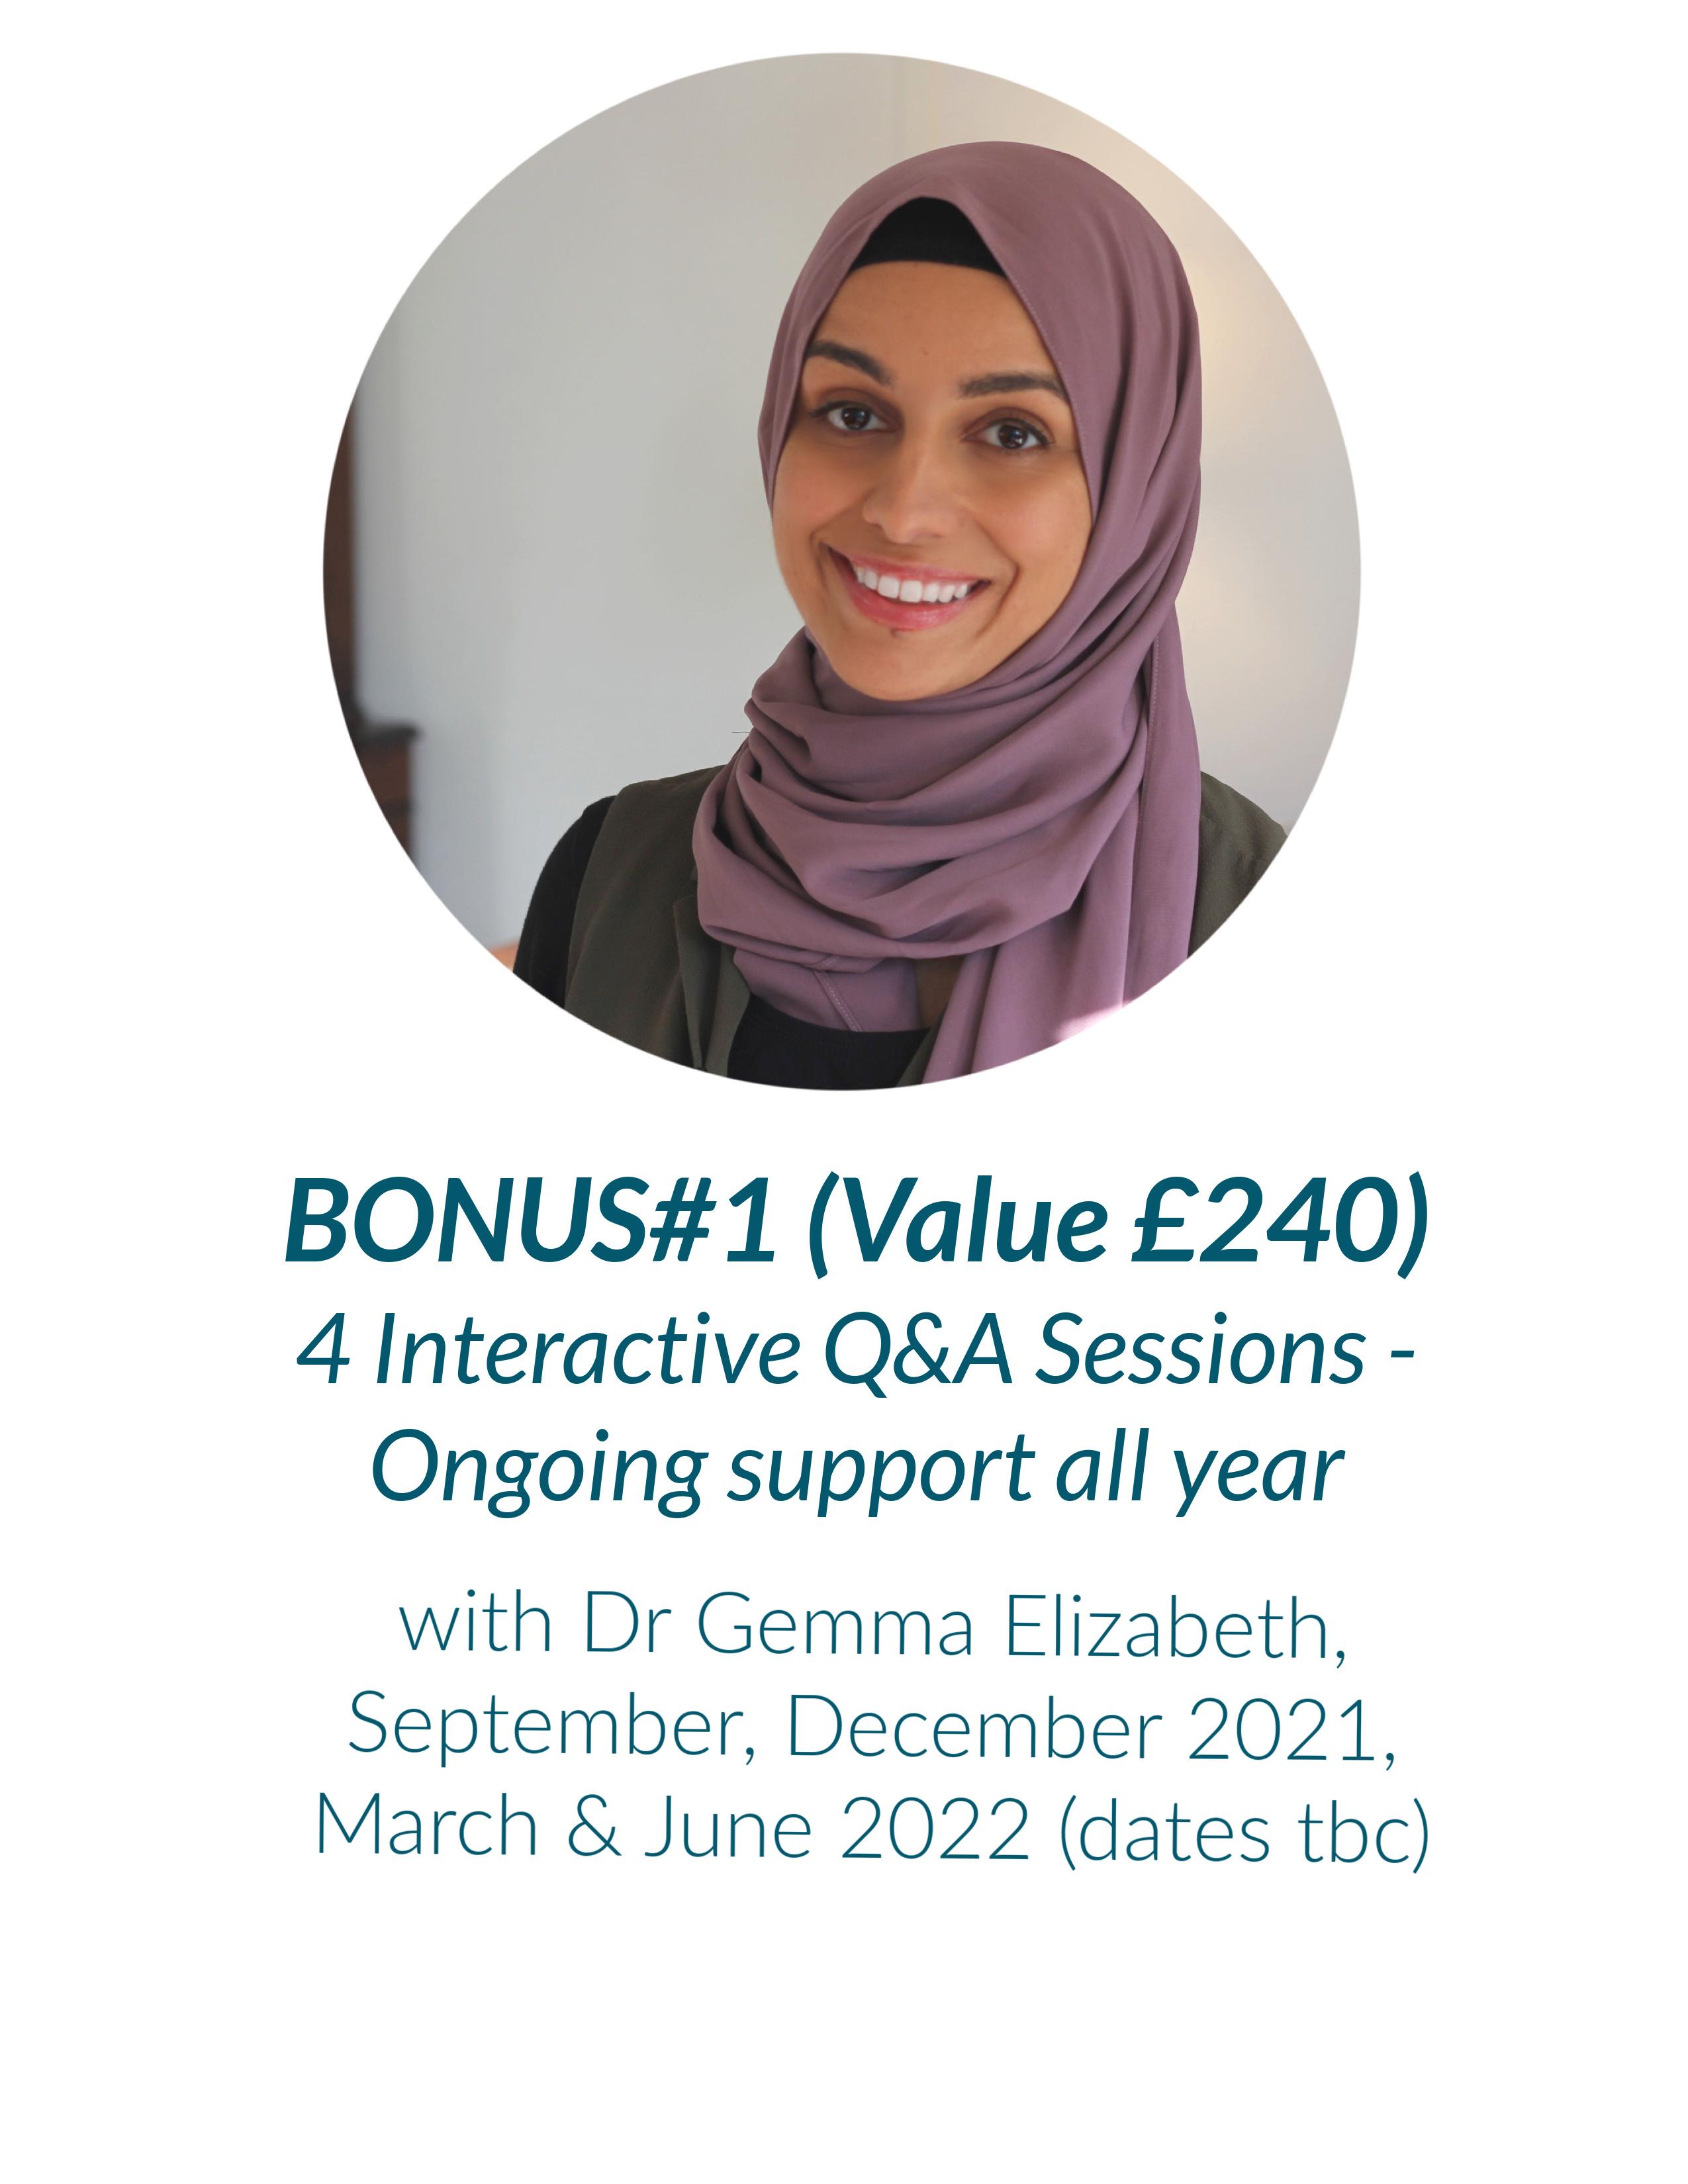 Bonus Q&As with Dr Gemma